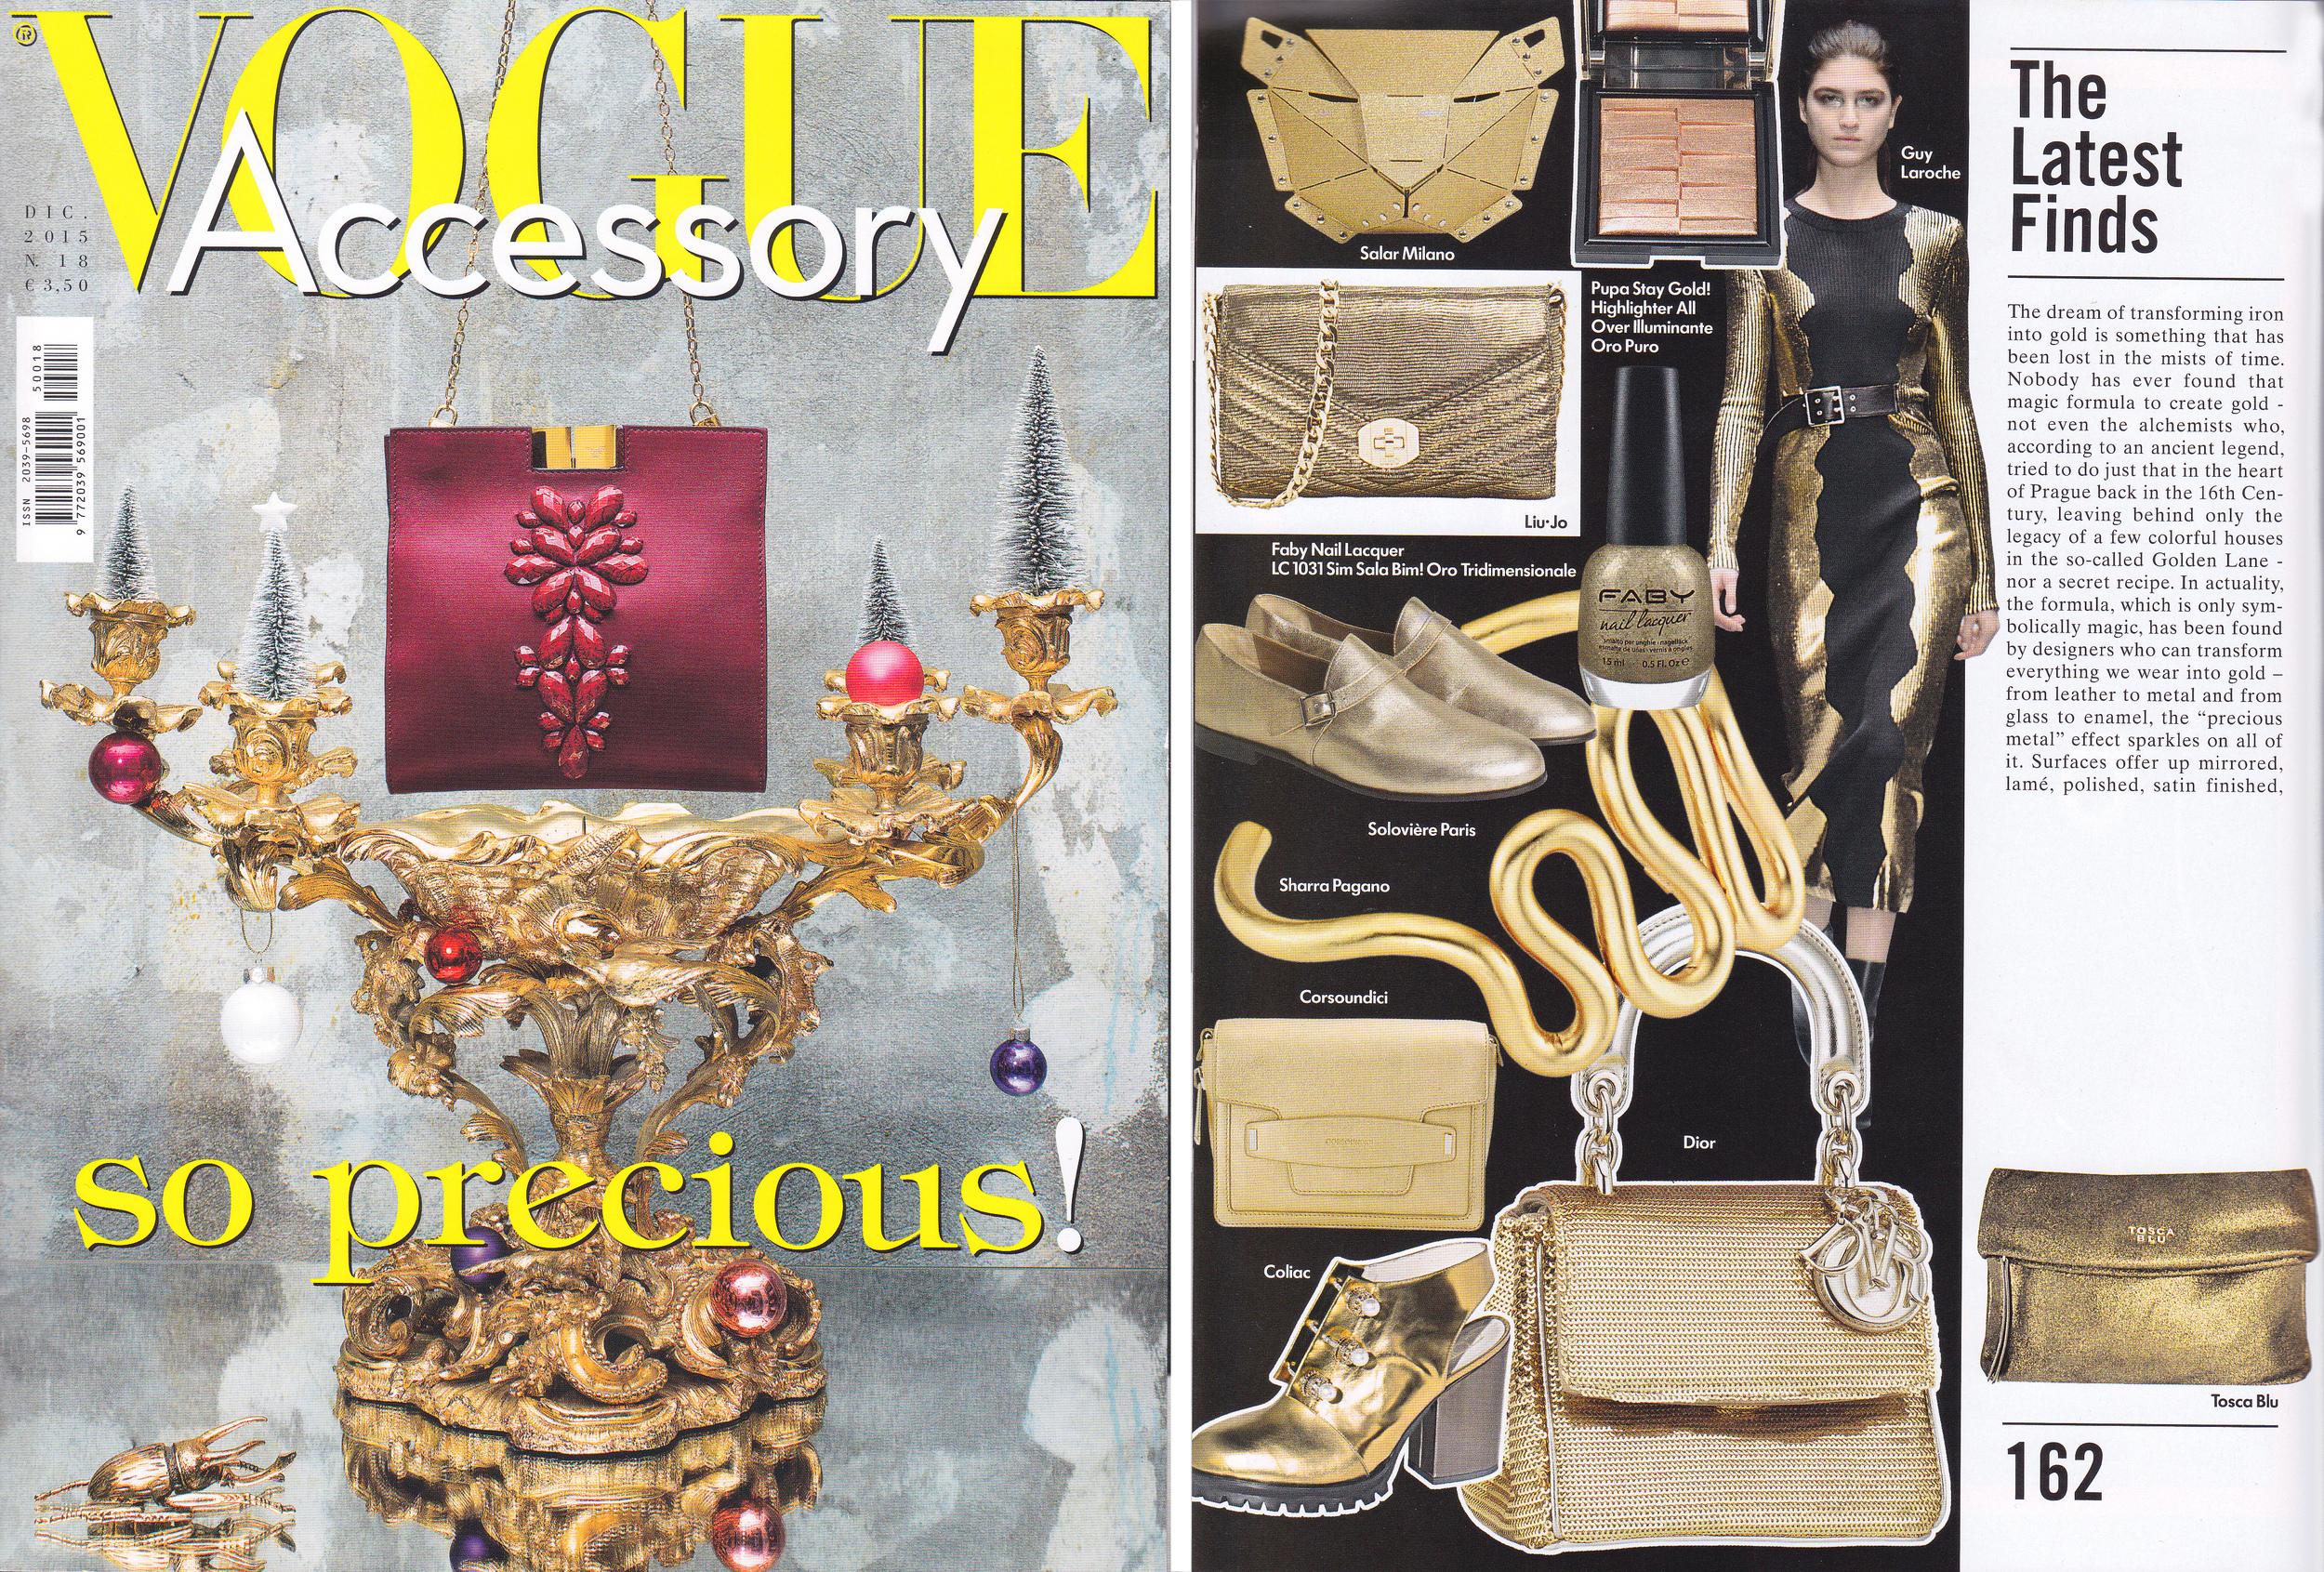 Vogue Accessory - December 2015 - Italy - Xaguara